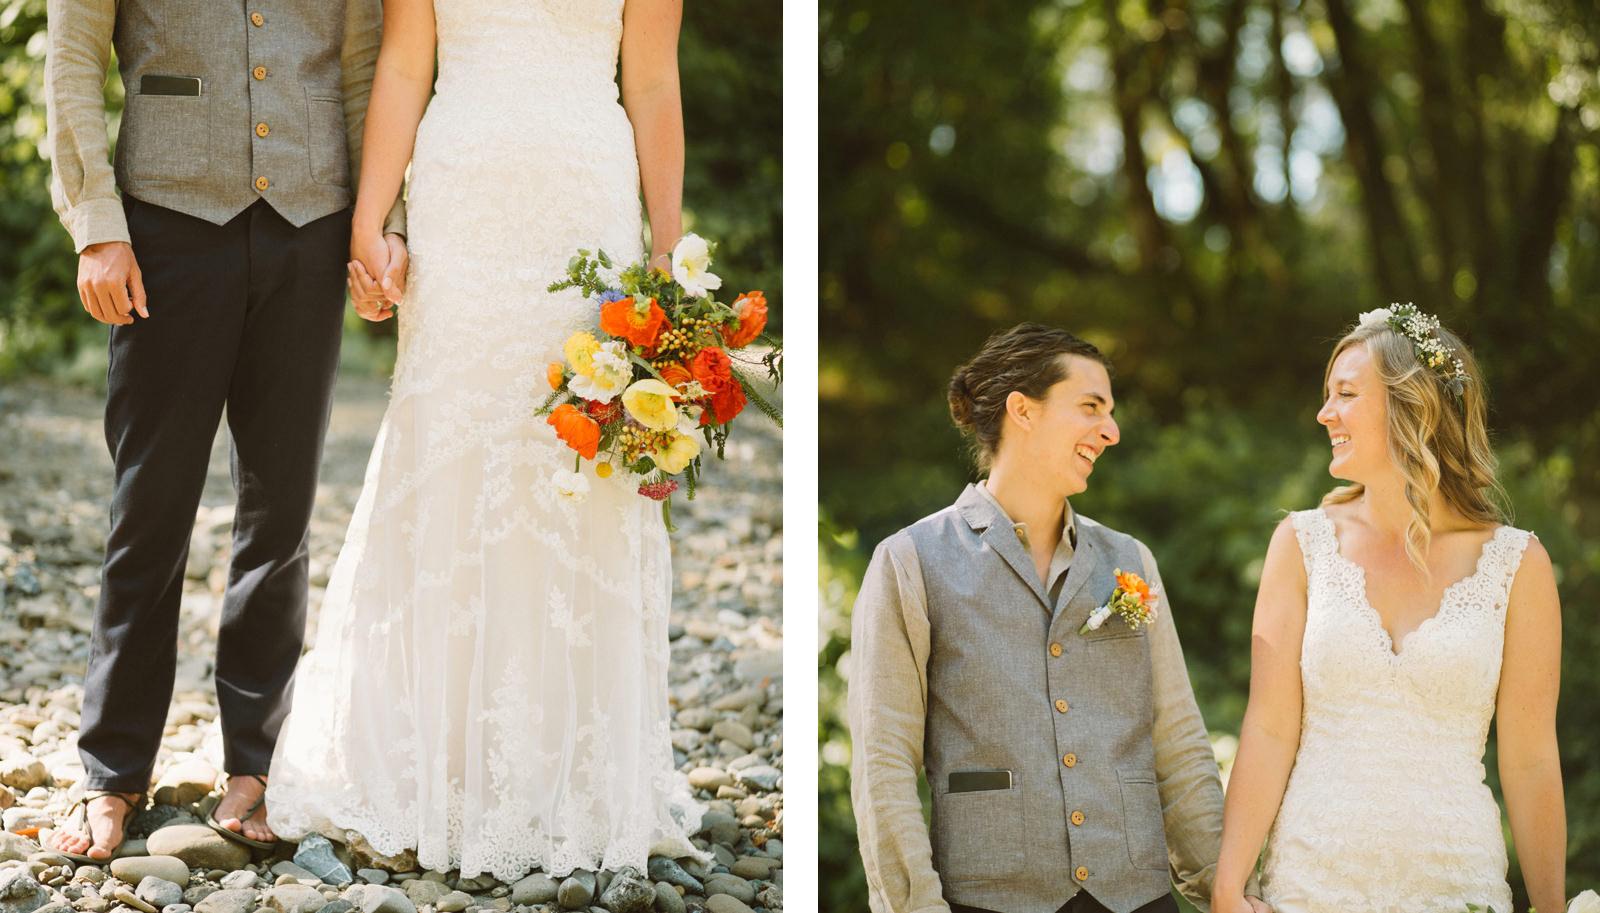 rivers-bend-retreat-wedding-057 RIVER'S BEND RETREAT WEDDING